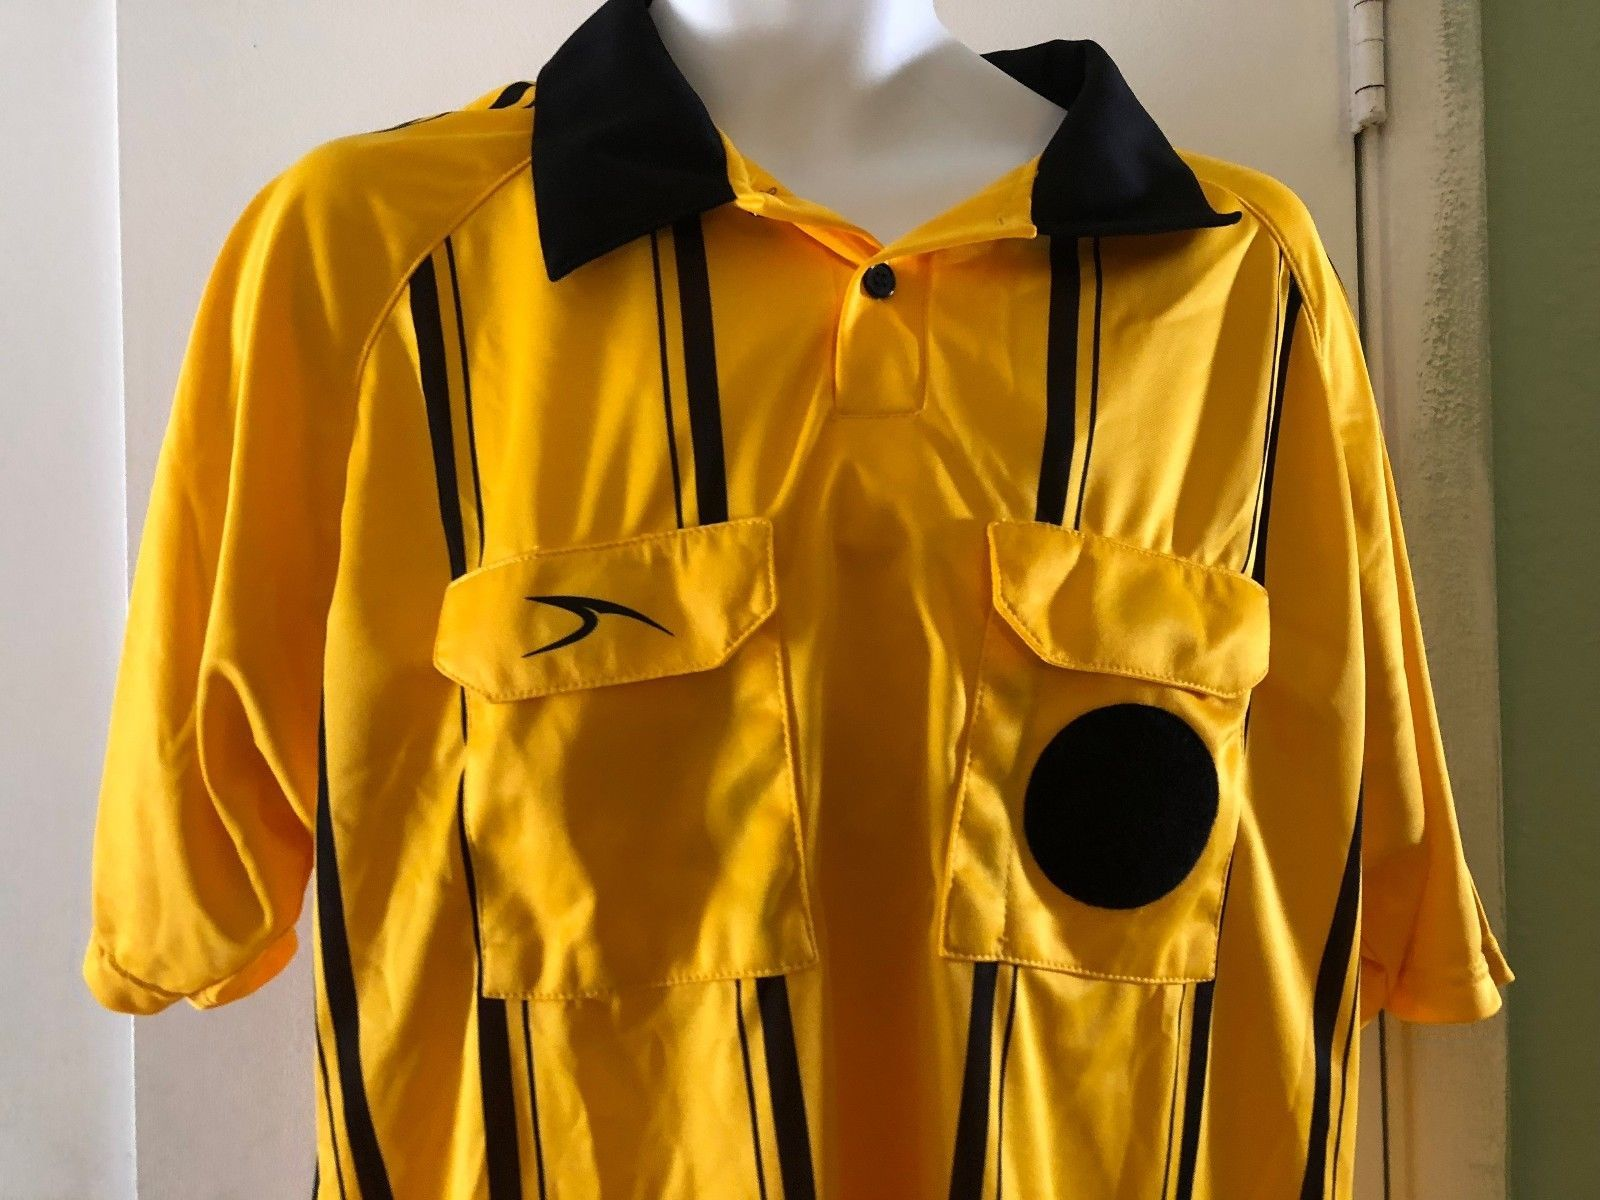 799b6a67648 Score Soccer Referee Jersey Shirt Yellow and 50 similar items. 57